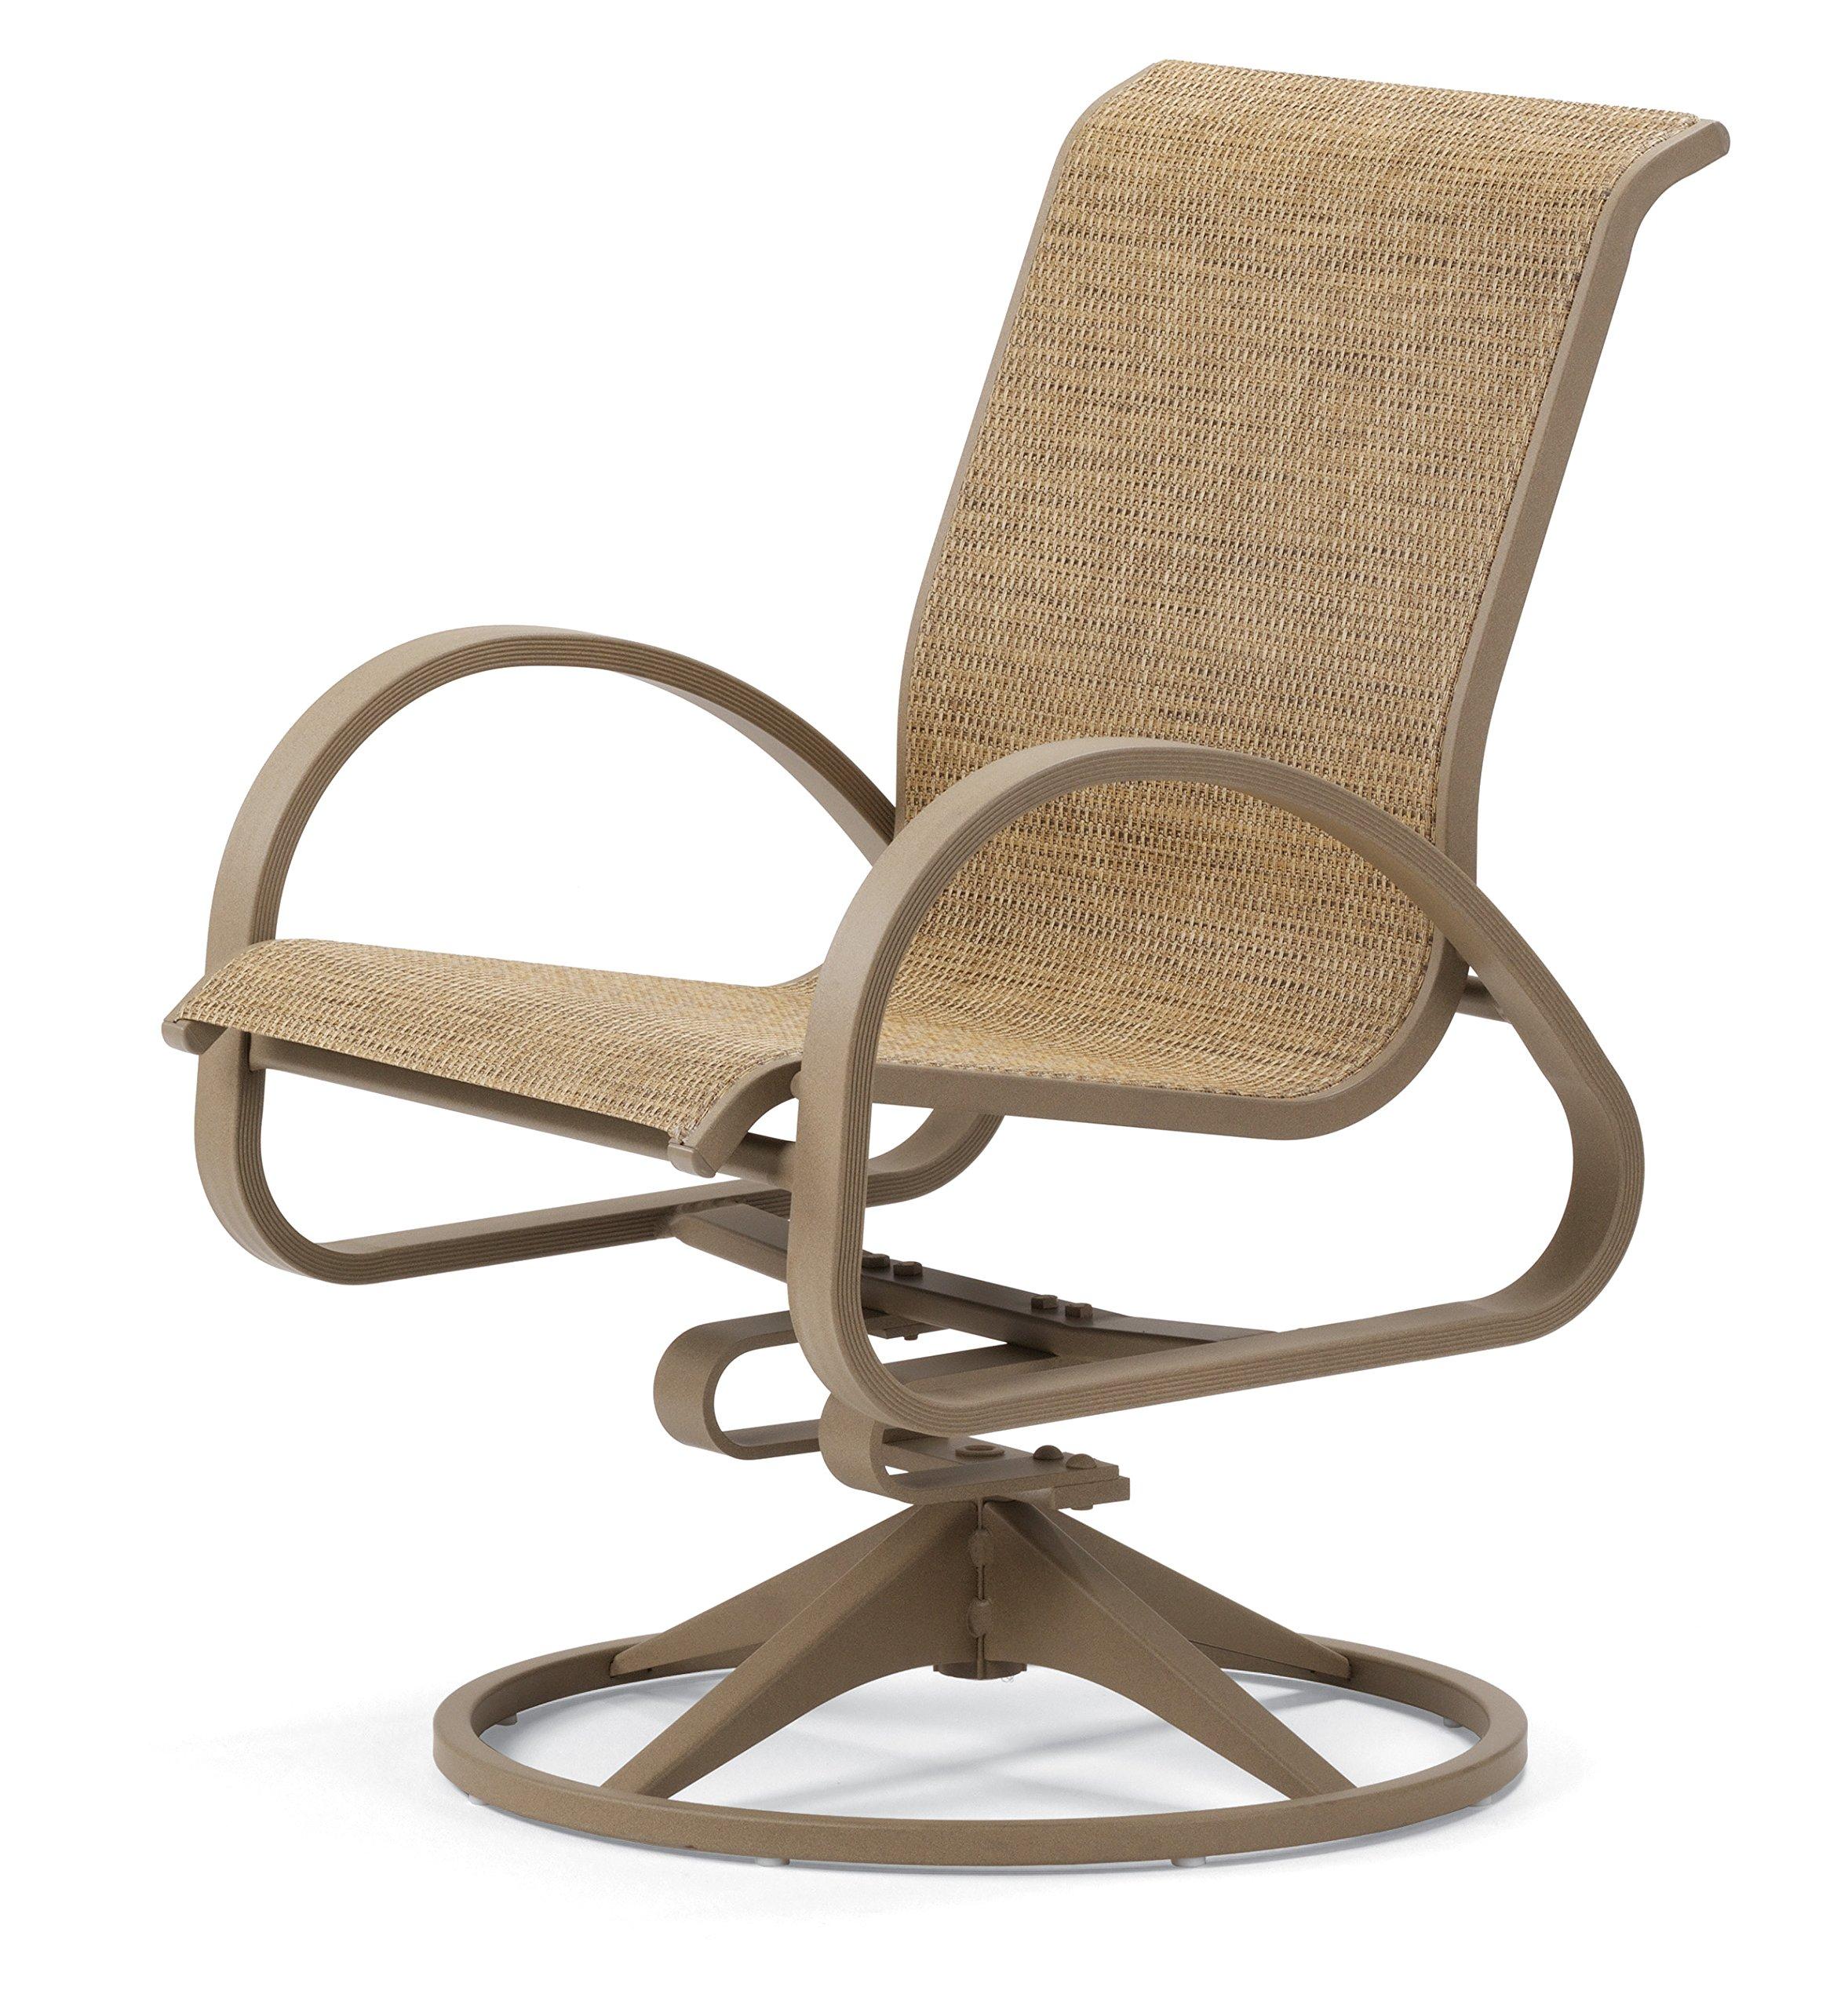 Telescope Casual Furniture Aruba II Sling Collection Aluminum Swivel Rocker, Pecan, Textured Desert Finish